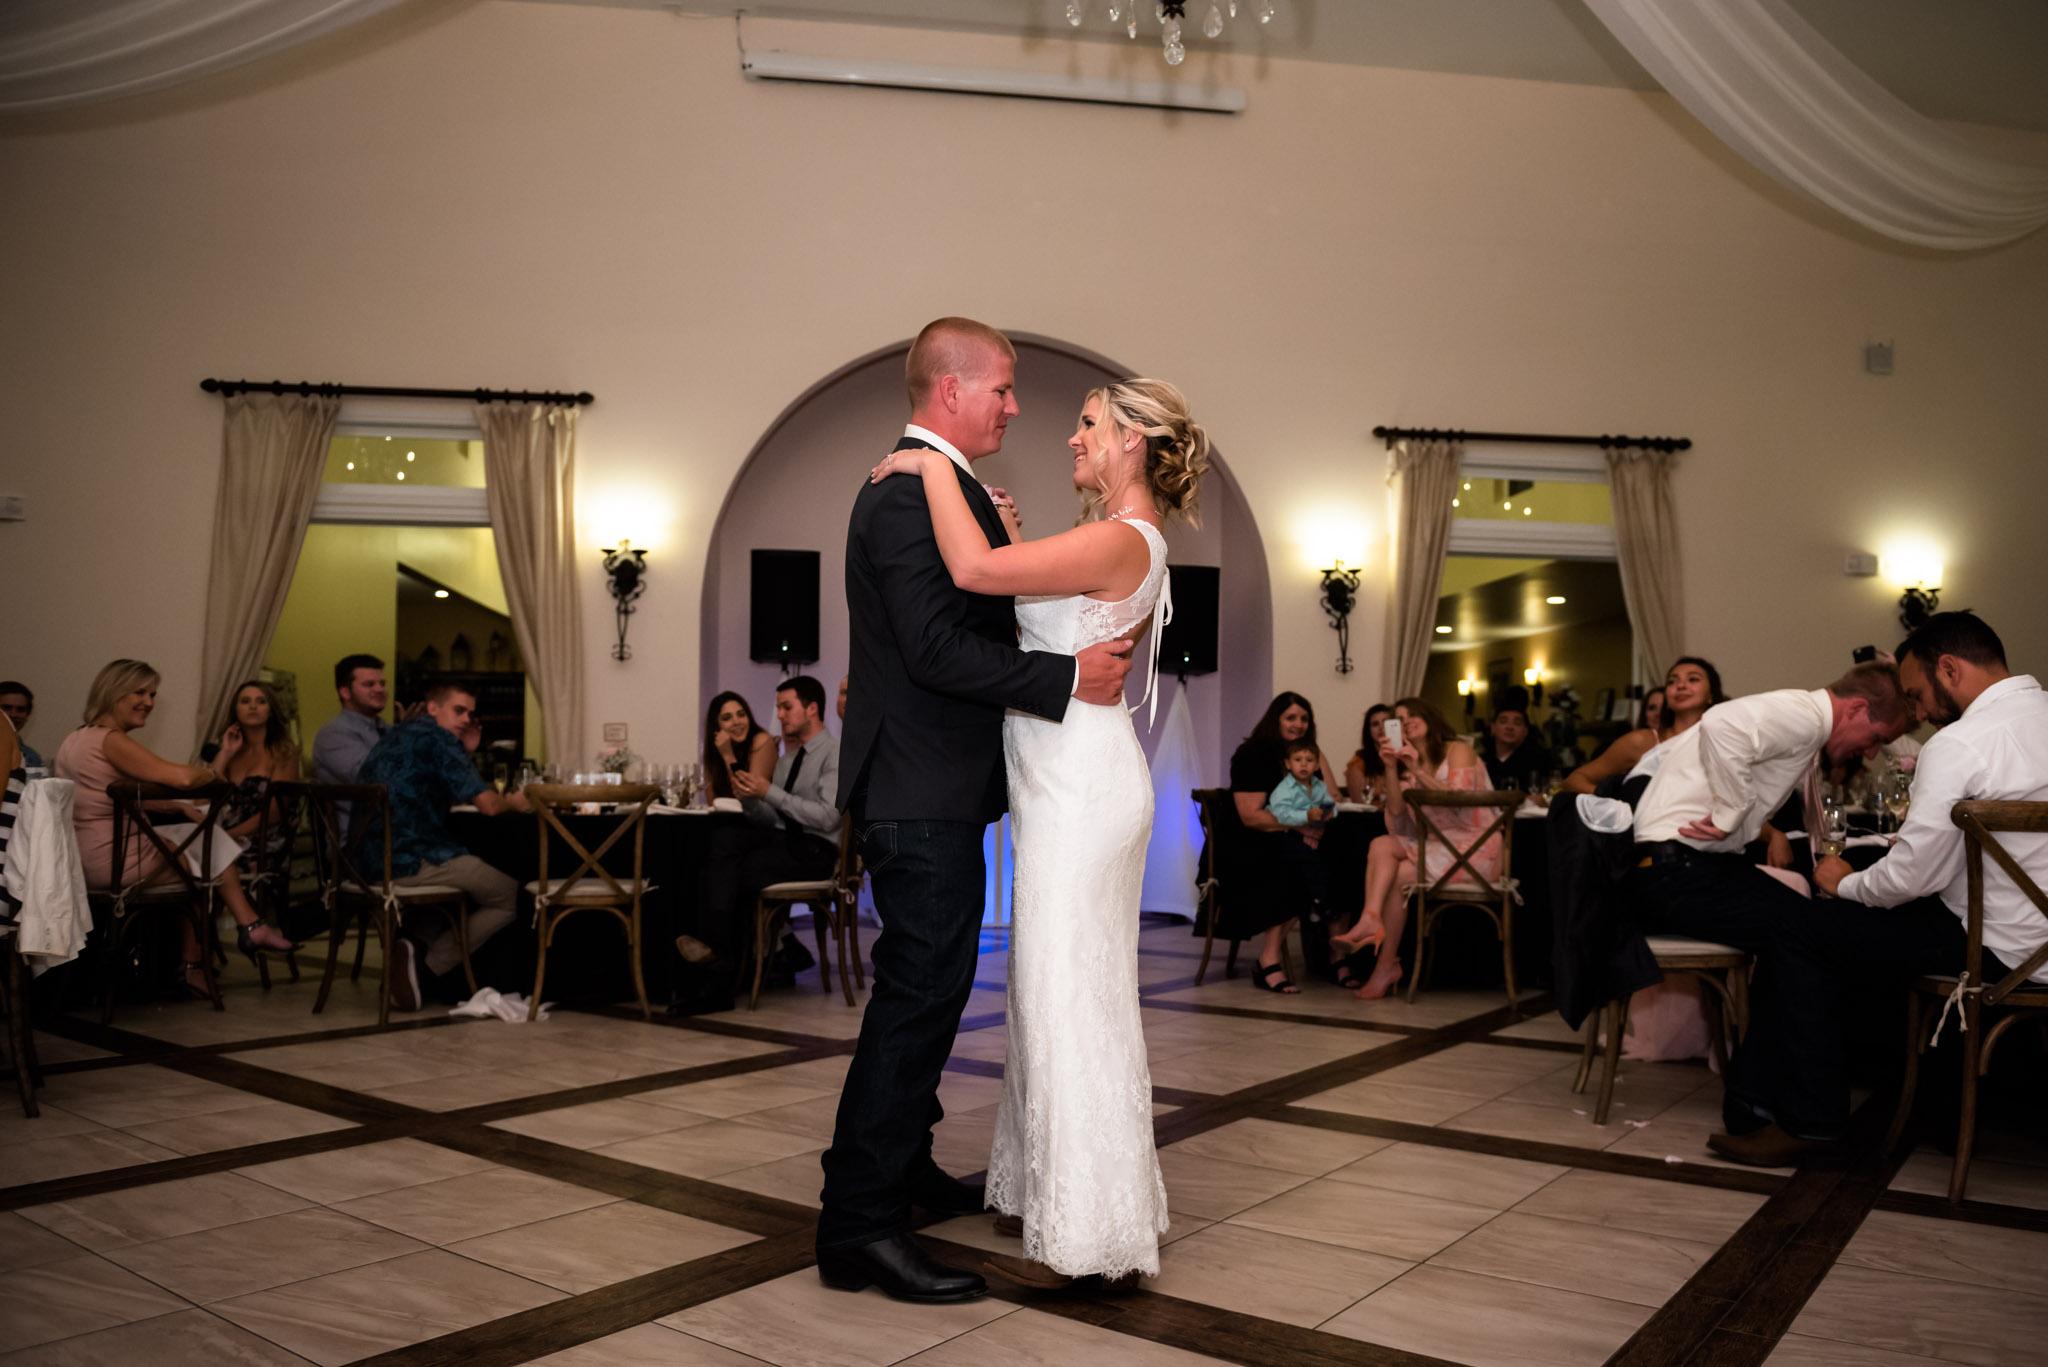 Avensole-Winery-Temecula-Wedding-Josh-and-Olivia-3988.JPG